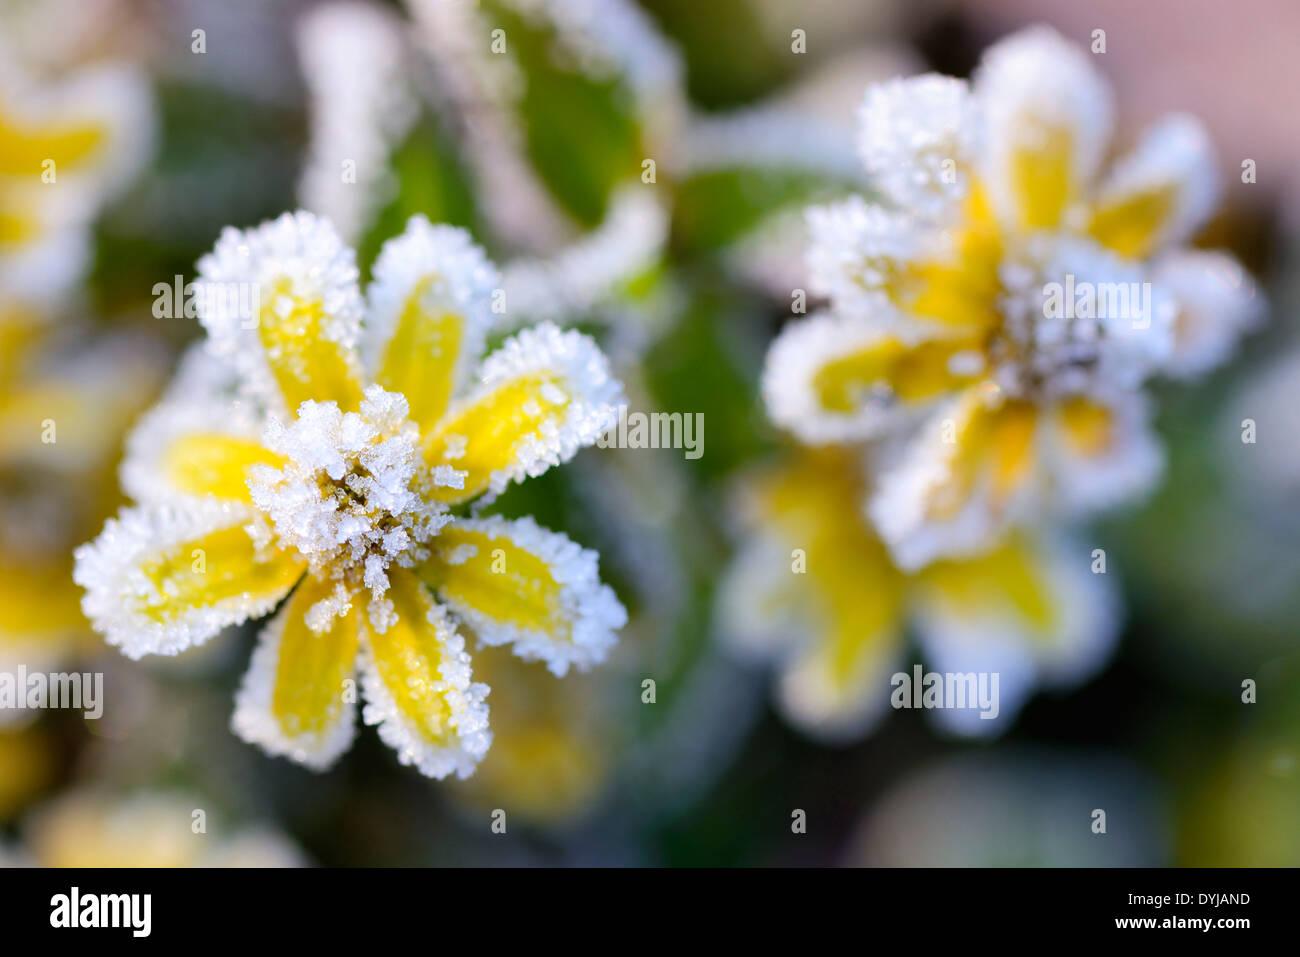 Sanvitalia procumbens, messicano creeping zinnia, in autunno, Husarenknopf (Sanvitalia speciosa) mit Raureif, Frost Immagini Stock